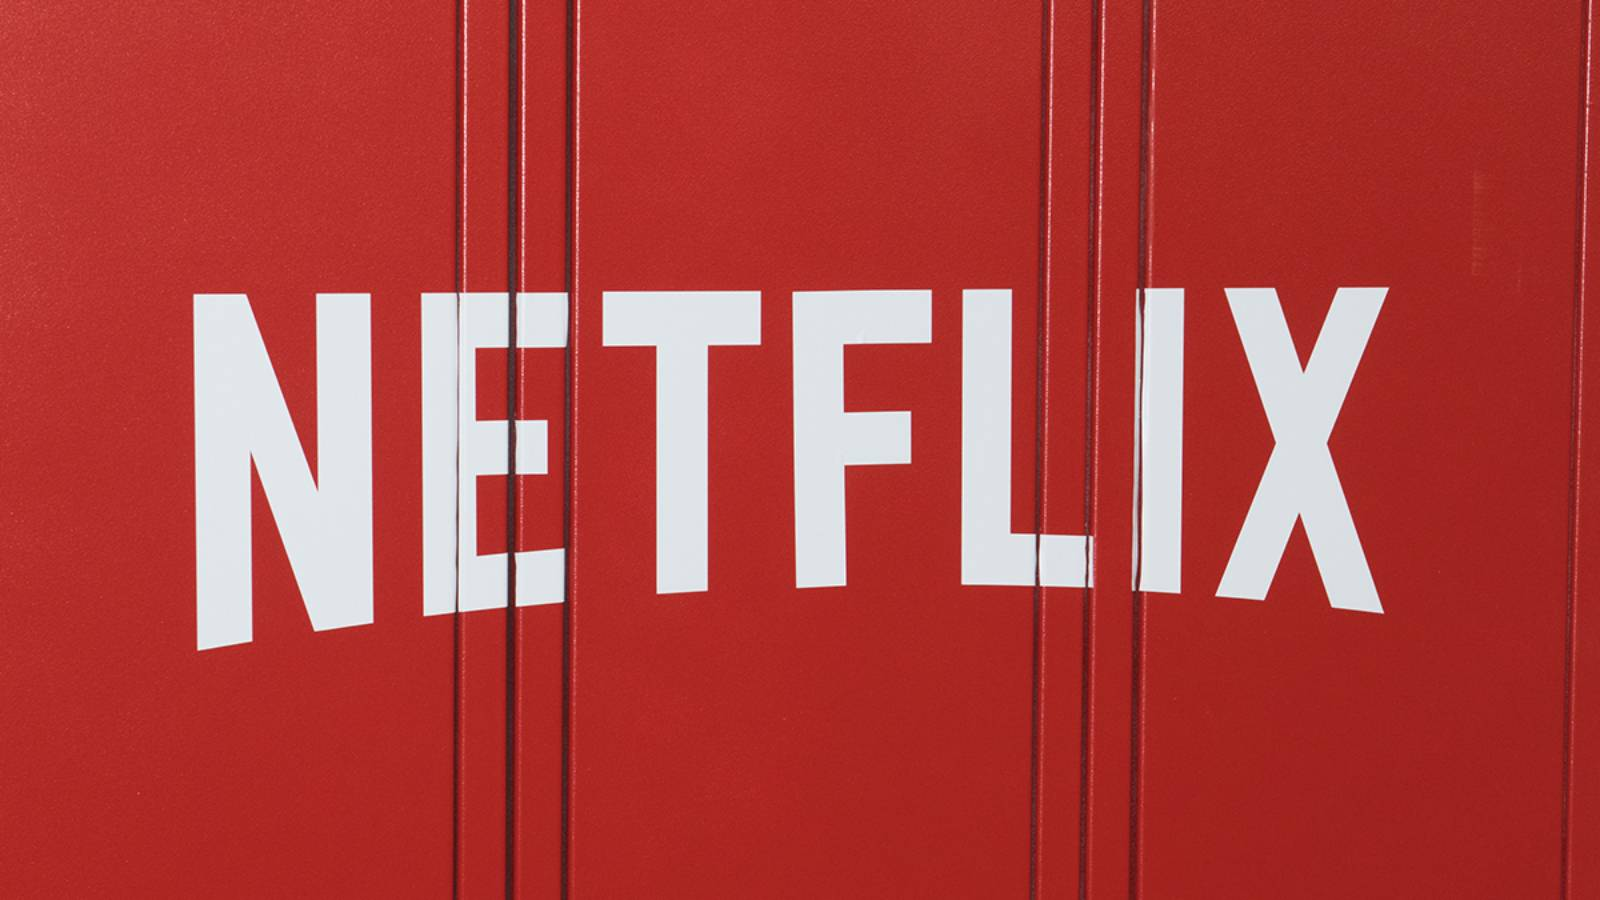 Netflix origins